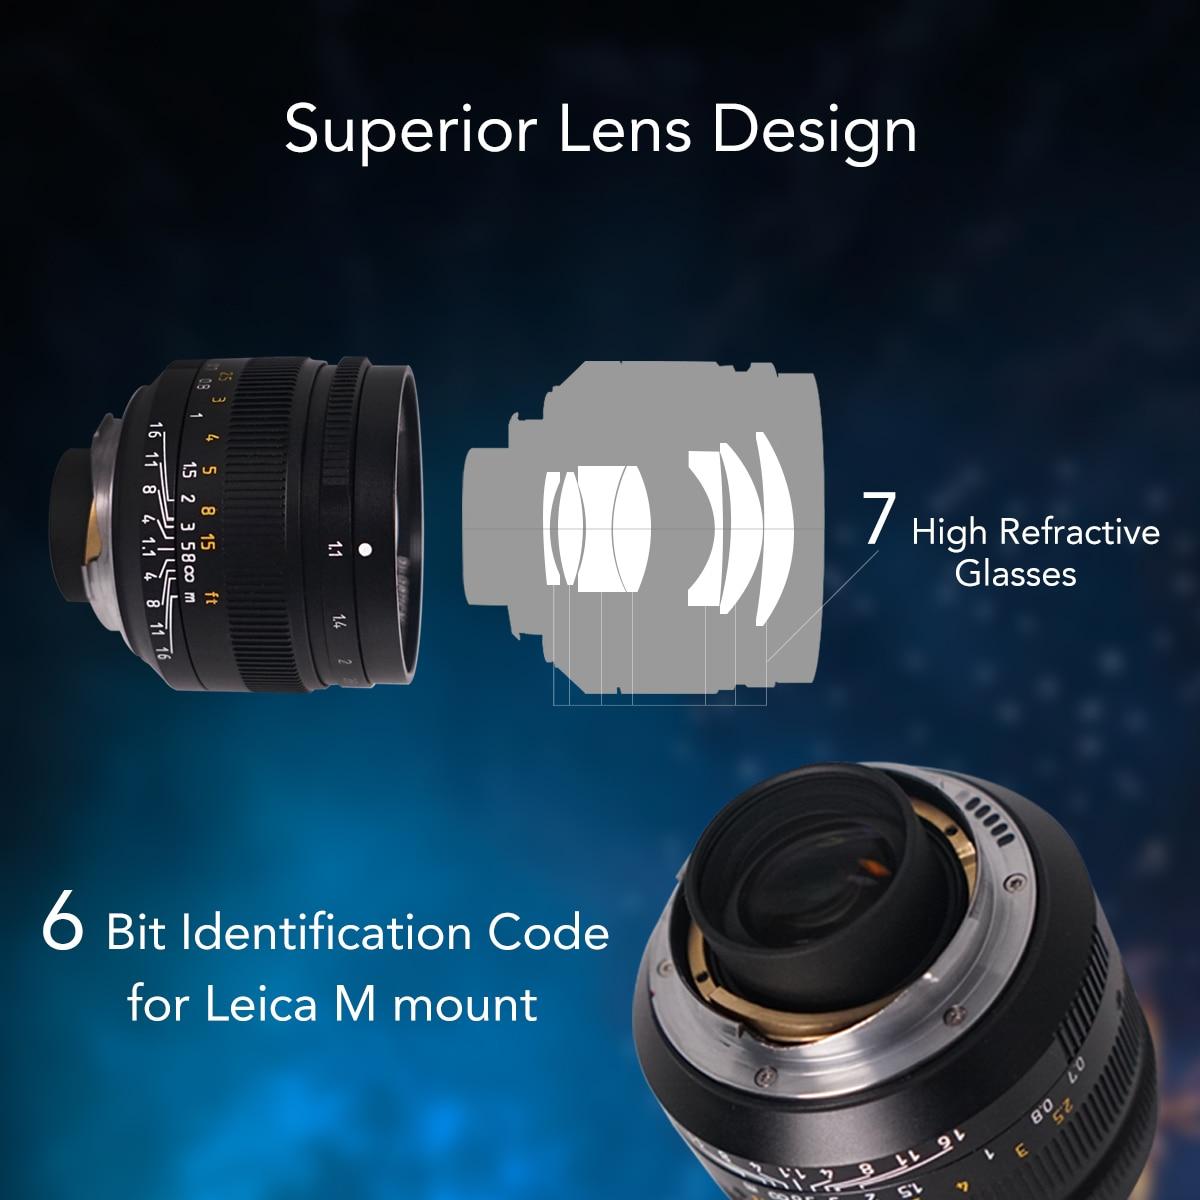 7 artesanos 50mm F1.1large apertura Paraxial M montaje de la lente para las cámaras M M240 M3 M5 M6 M7 M8 M9 M9p M10 - 6